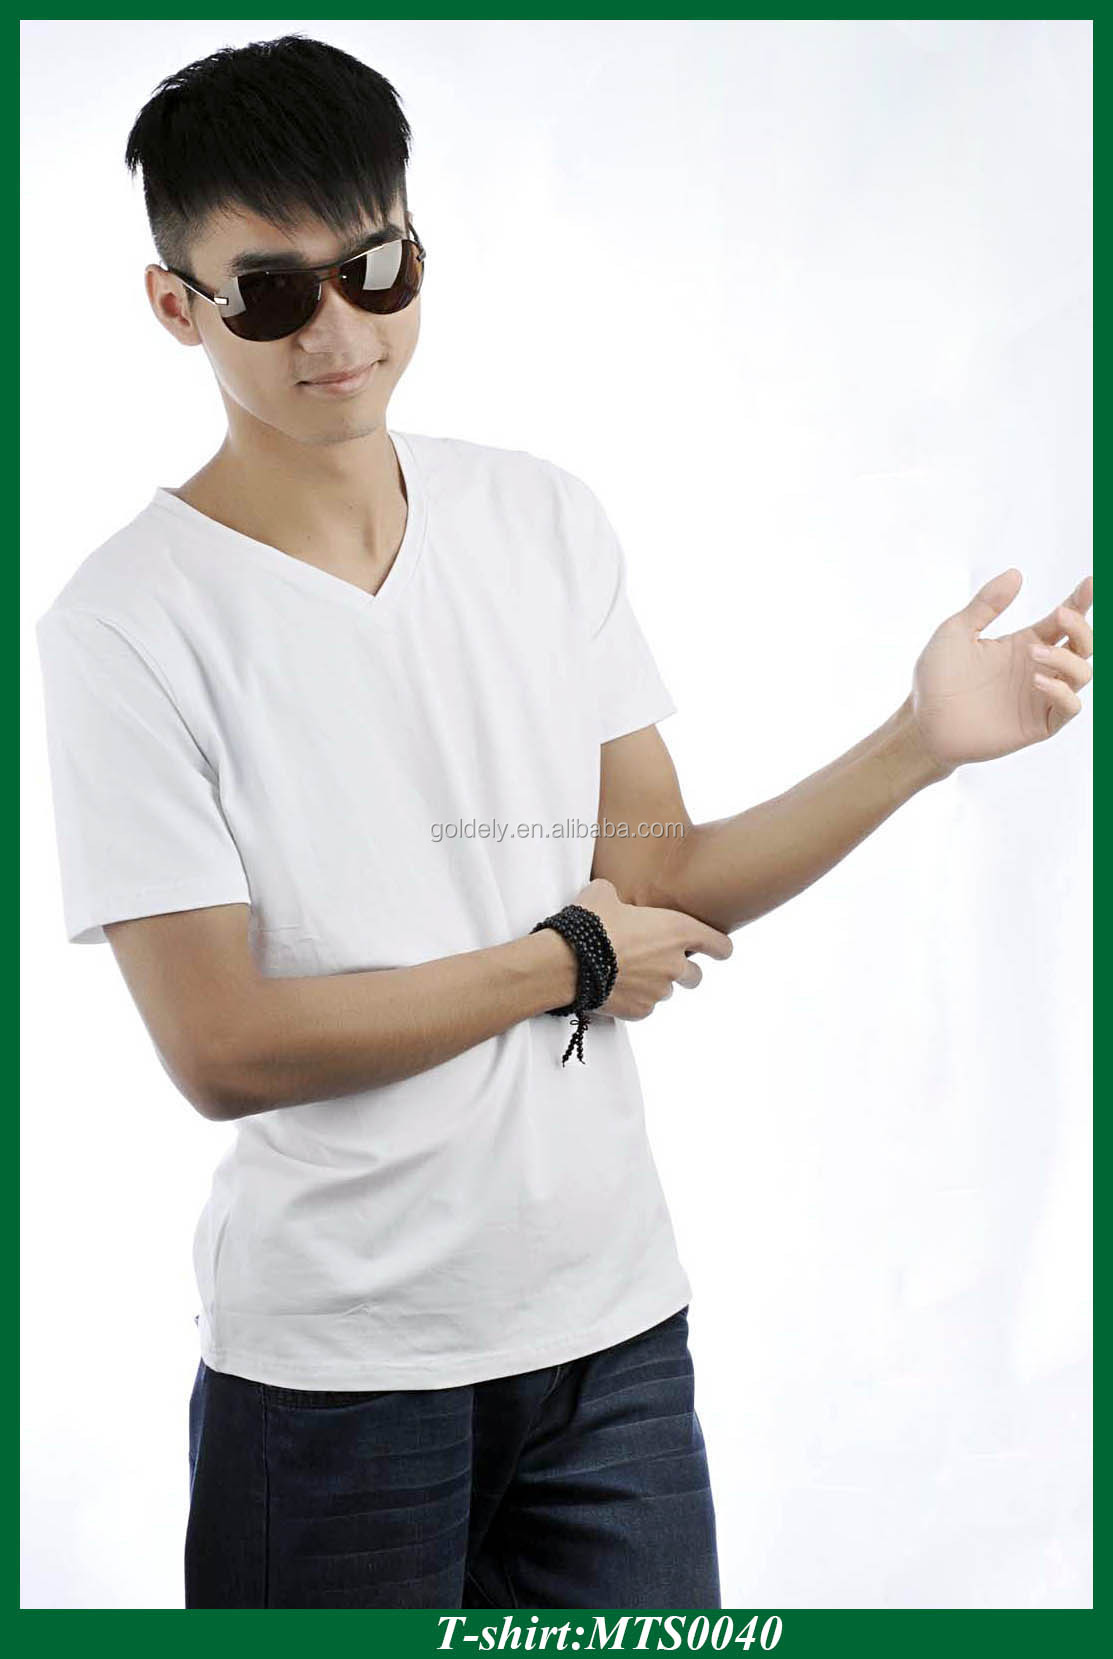 white t shirt35.jpg